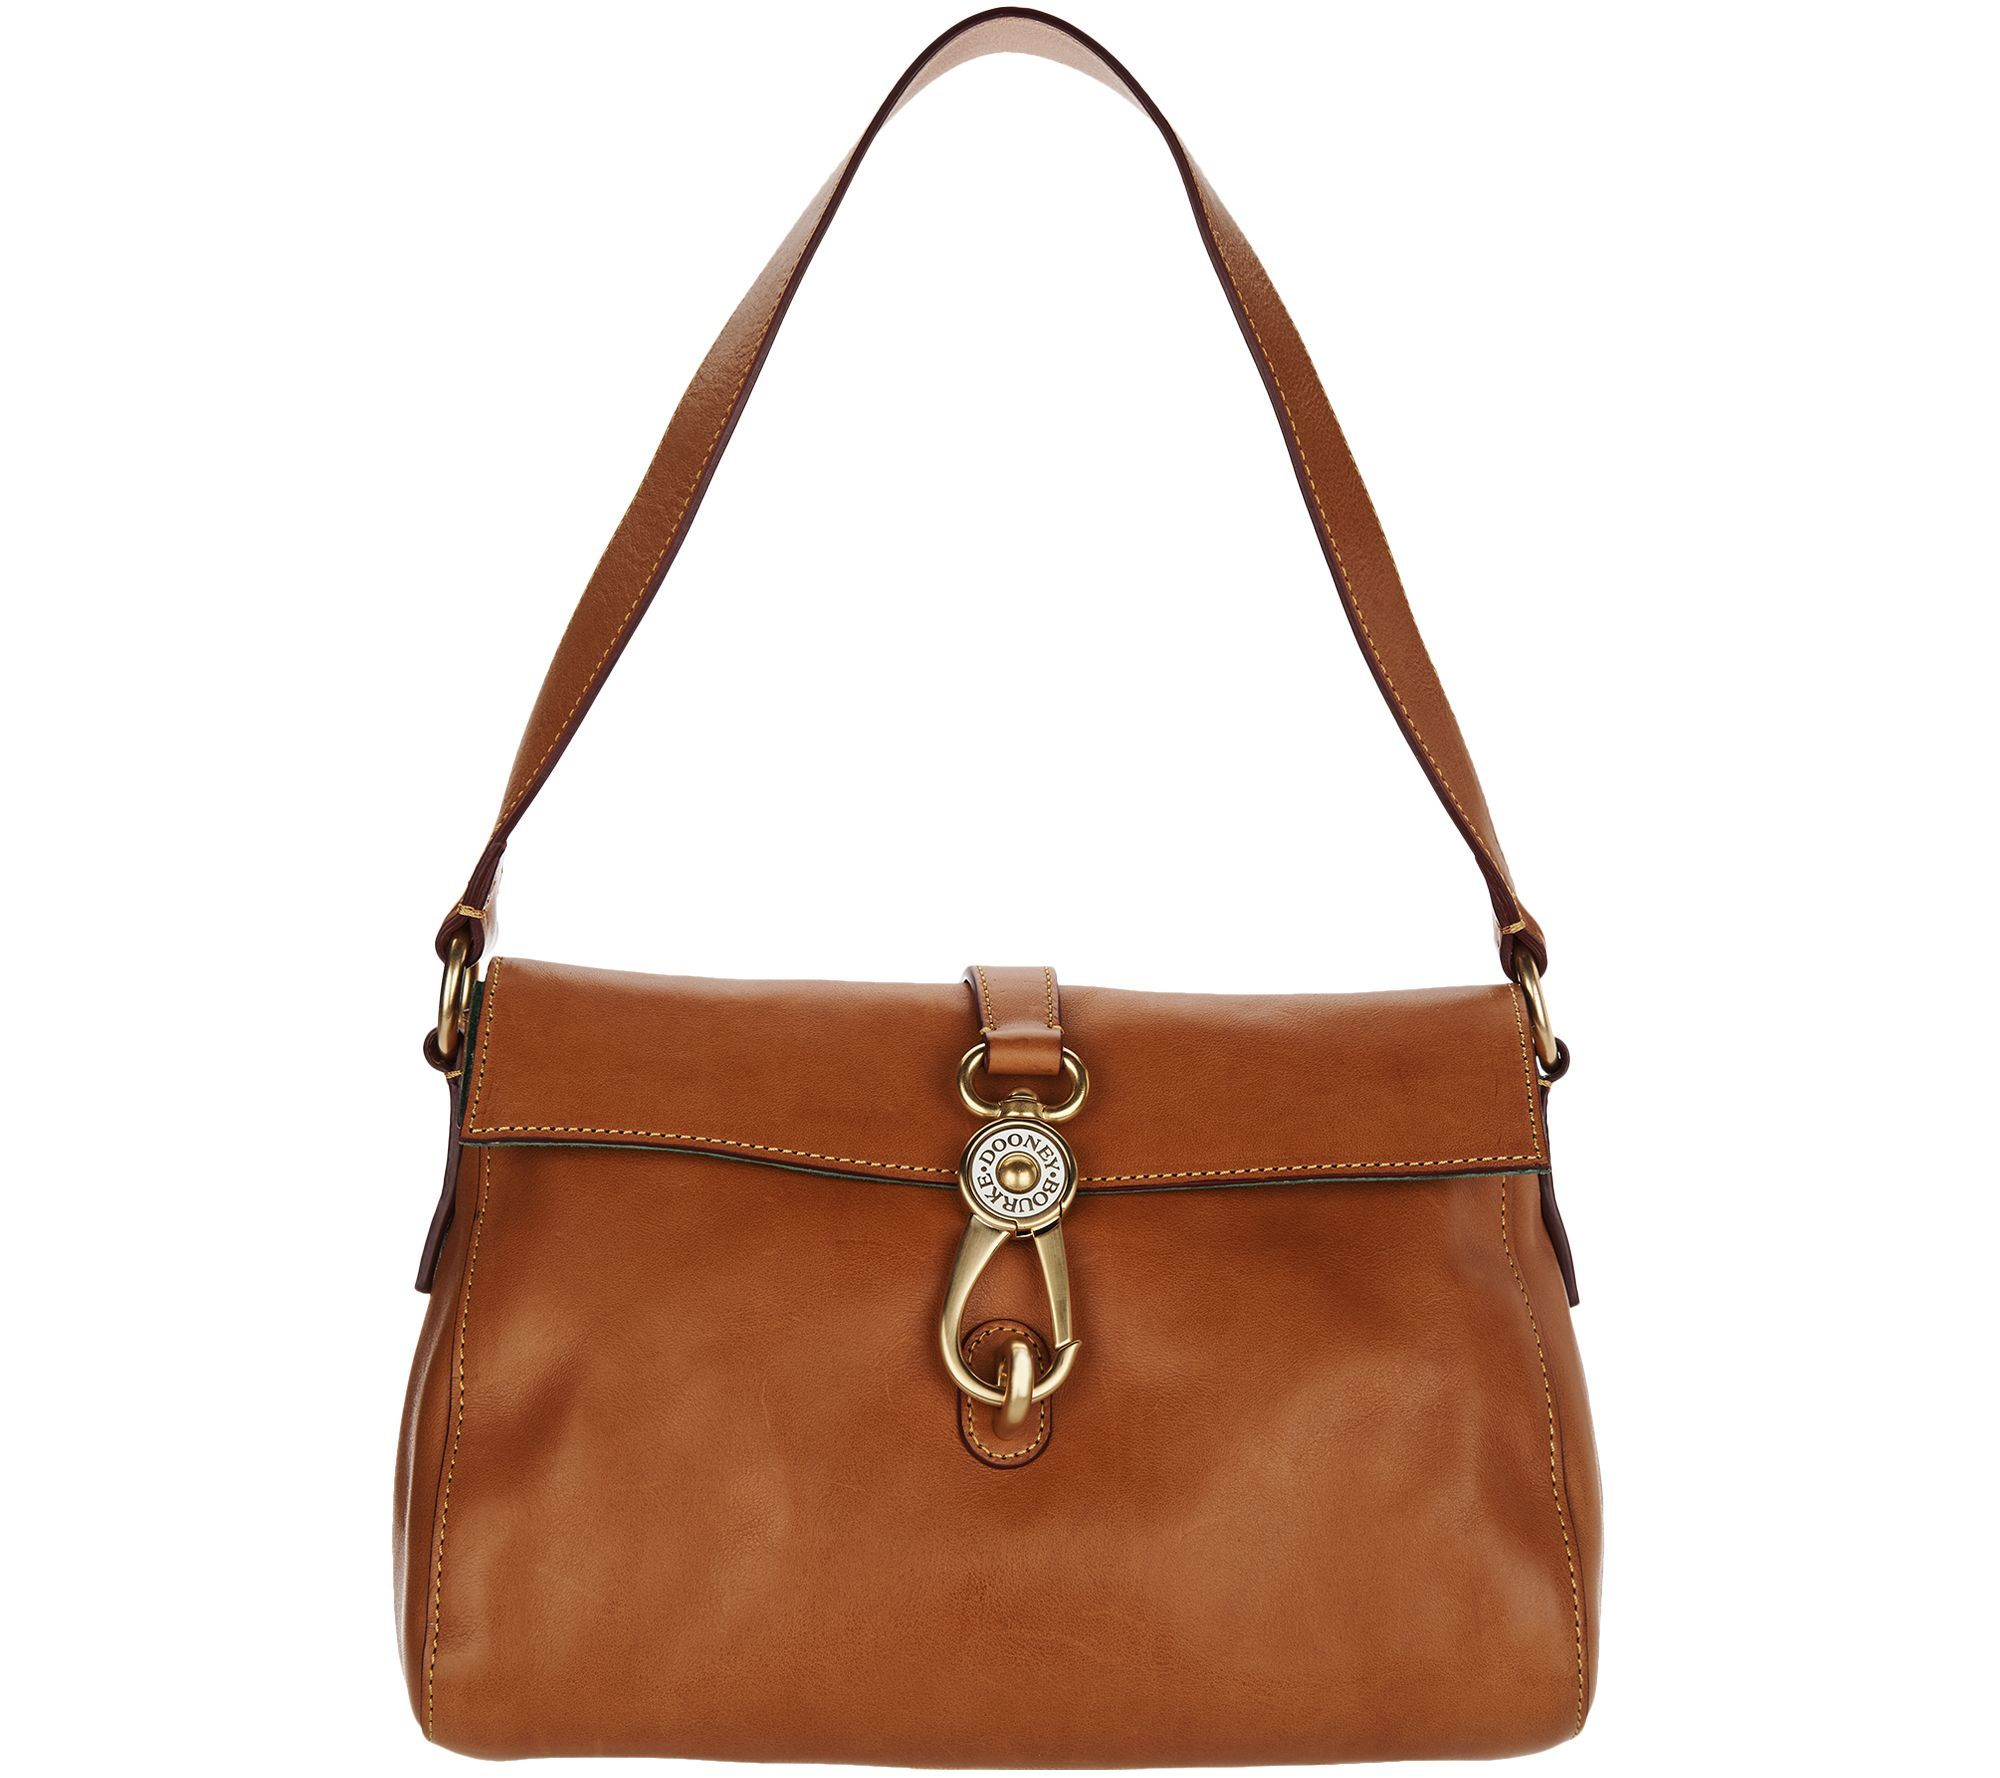 4014b77207b Dooney   Bourke Florentine Hobo Handbag -Libby - Page 1 — QVC.com